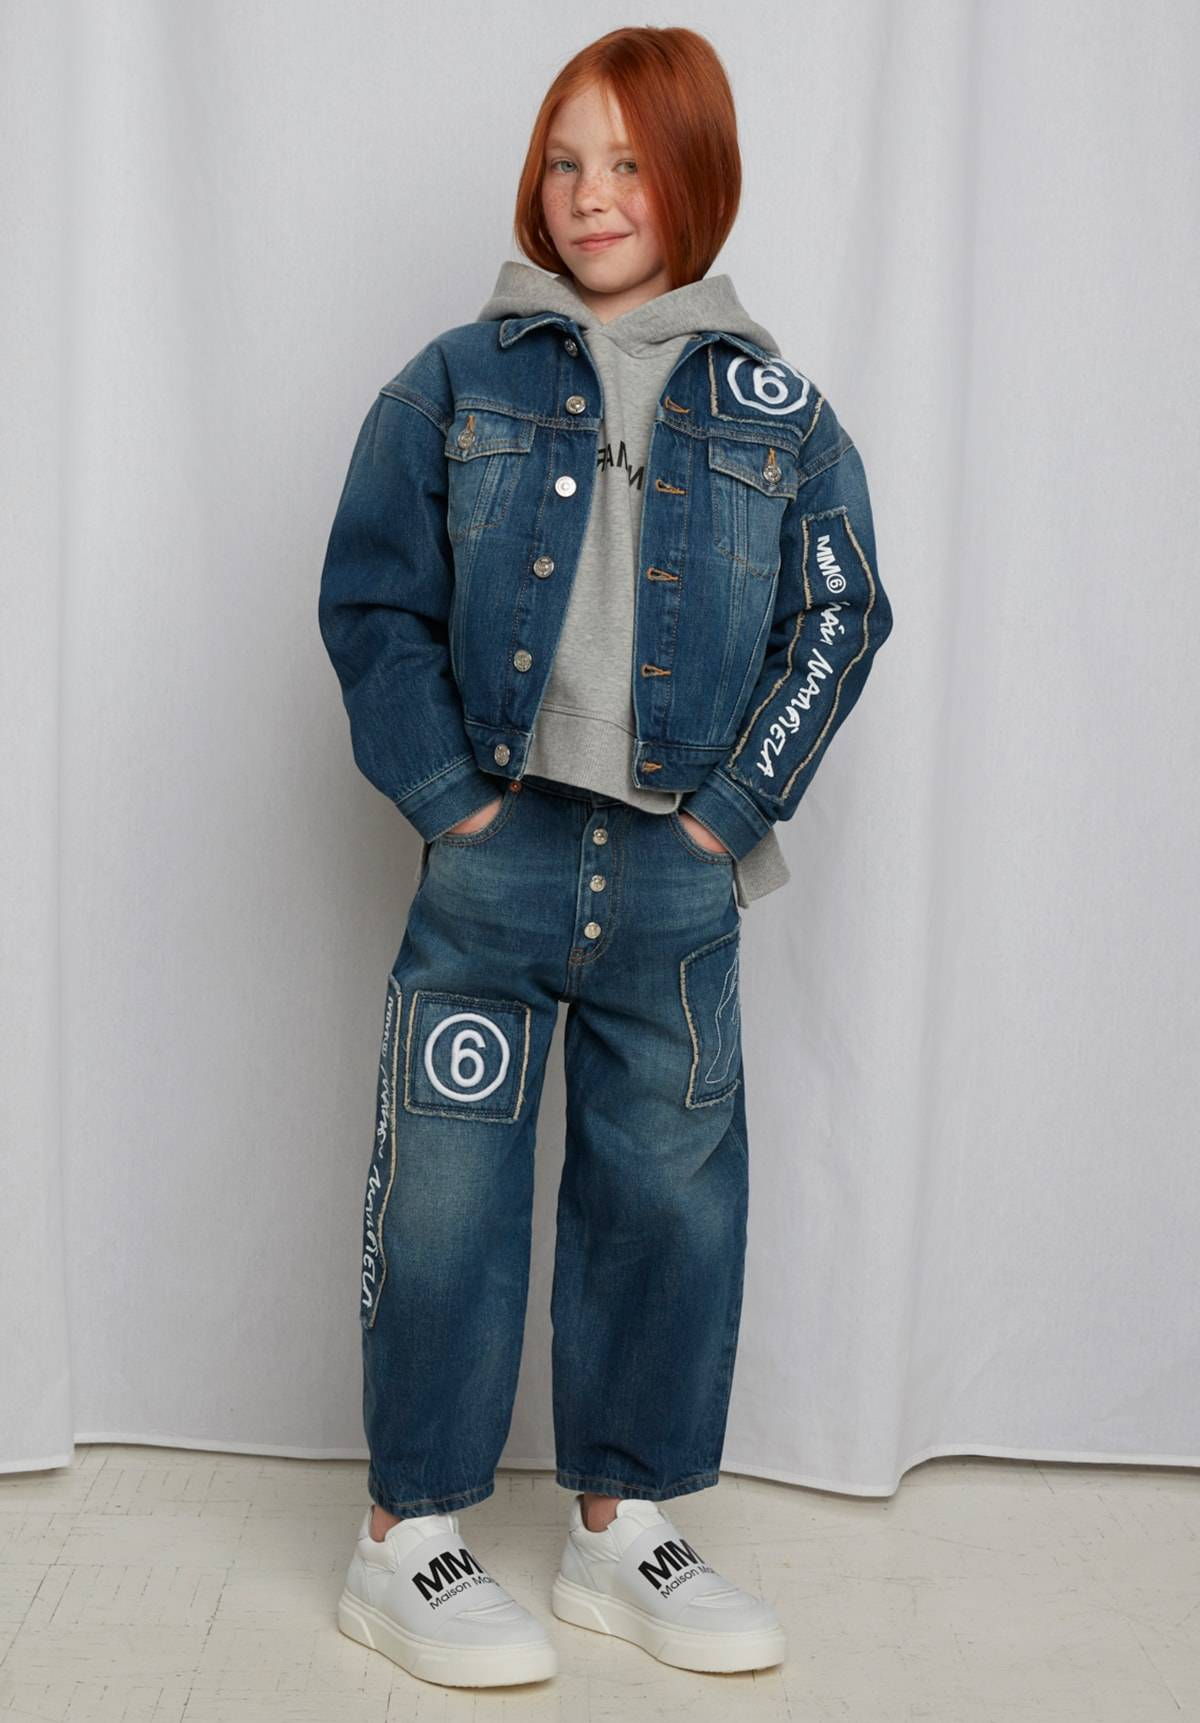 Brave Kid launches own e-commerce platform and extends brand portfolio